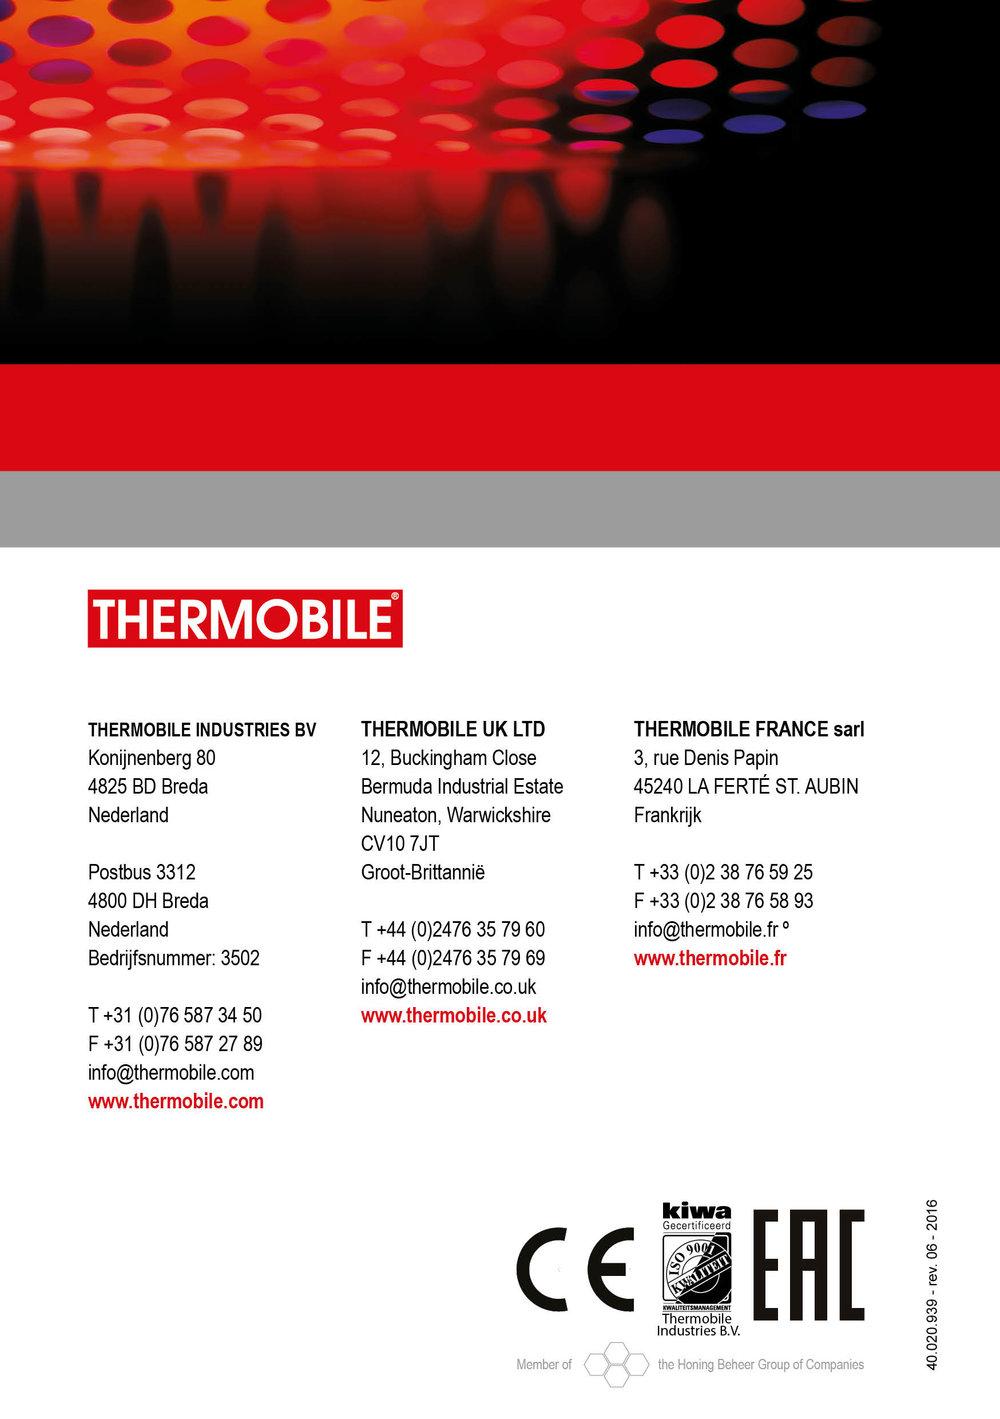 ZandBij_Thermobile_manual_64